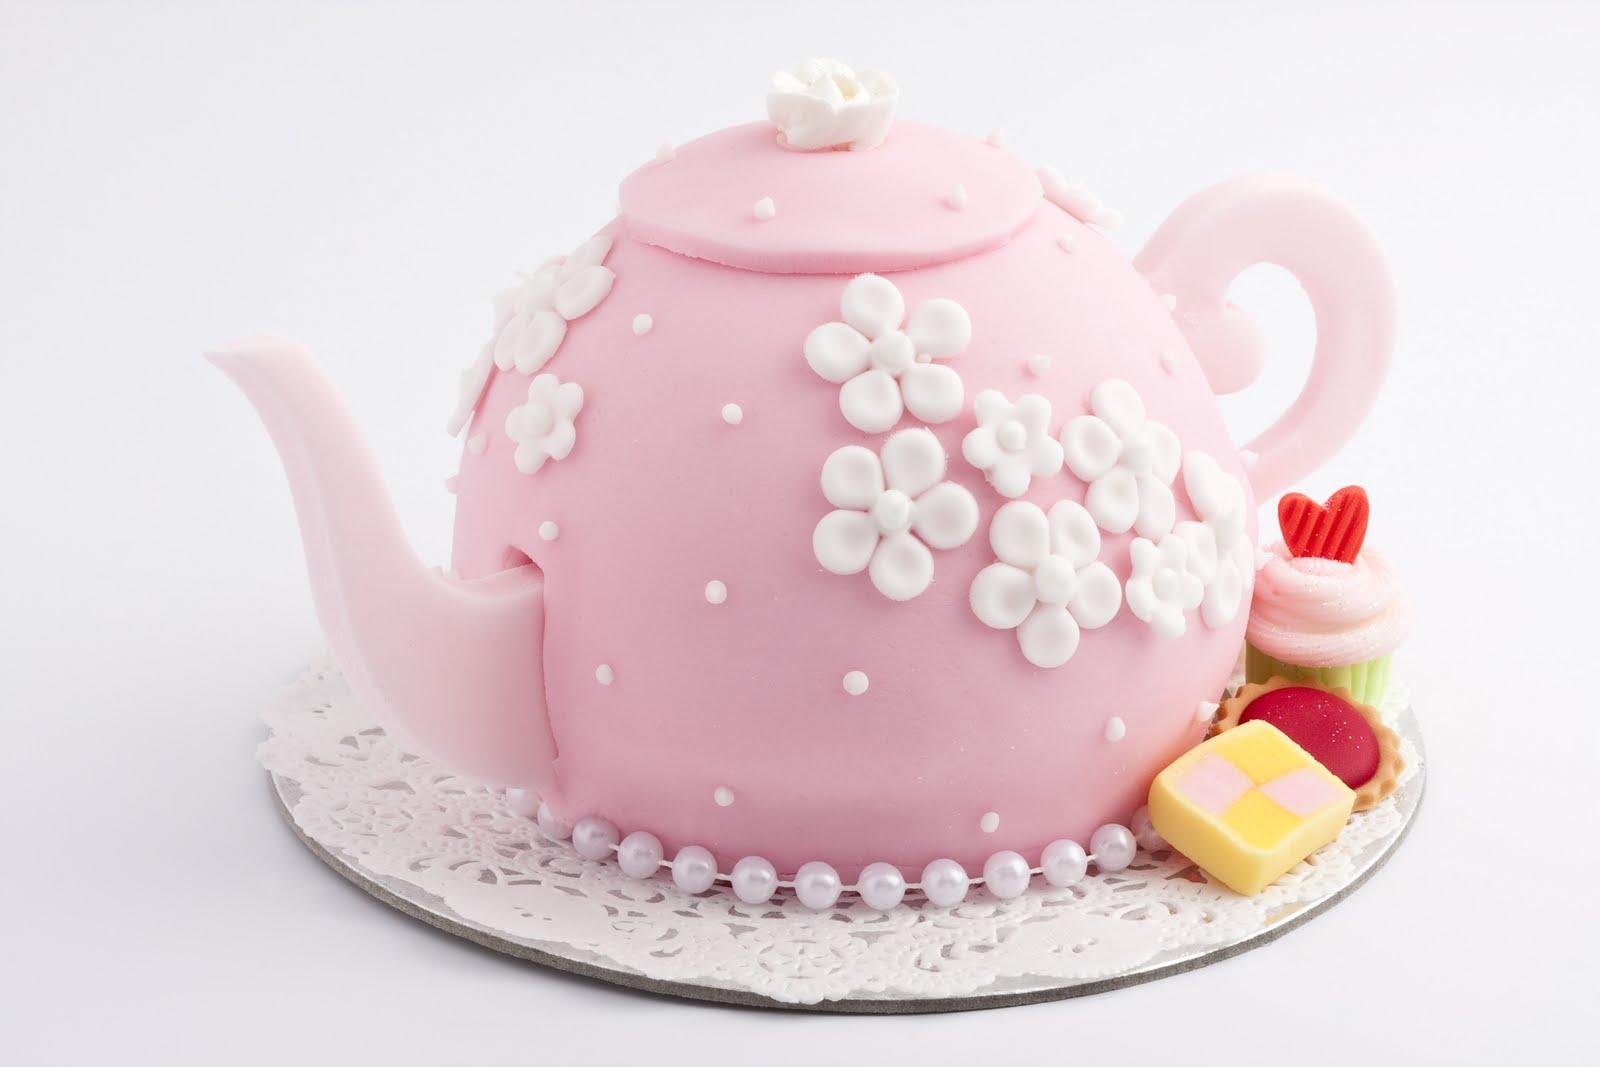 Kettle clipart tea cake Teapot And birthday 357 Filigrana